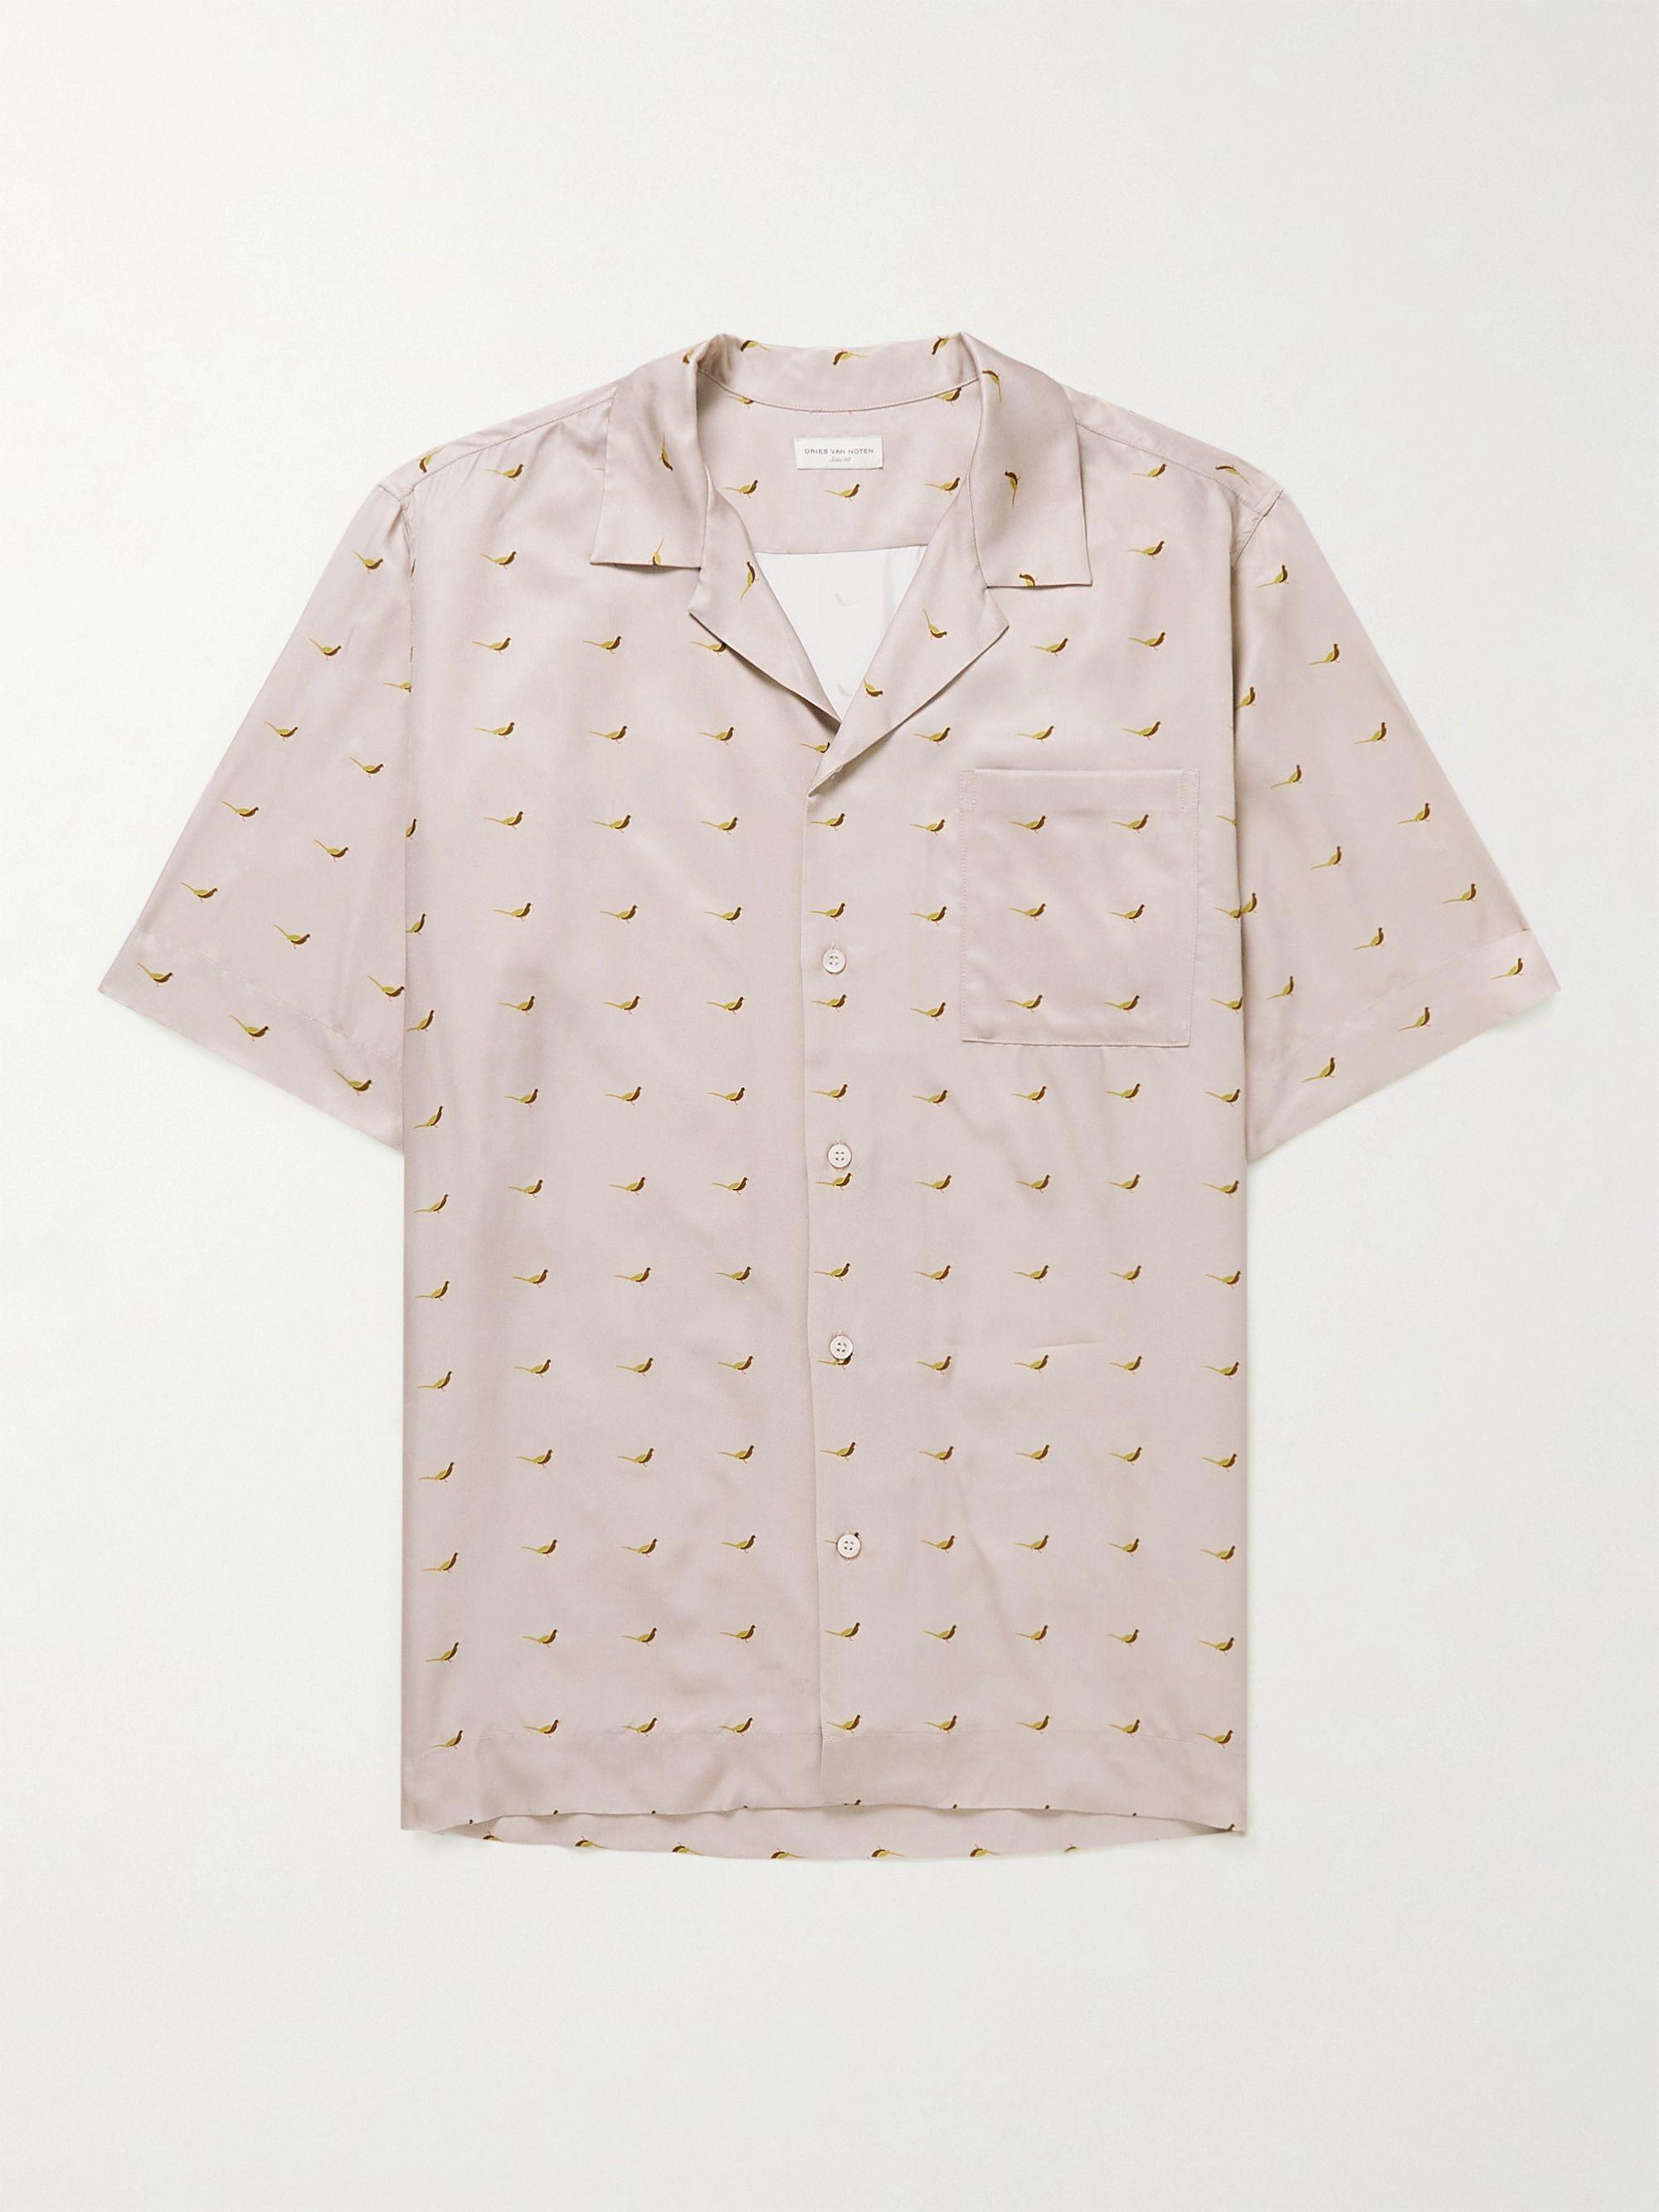 Dries Van Noten Carltone Camp-Collar Printed Satin Shirt,Pink